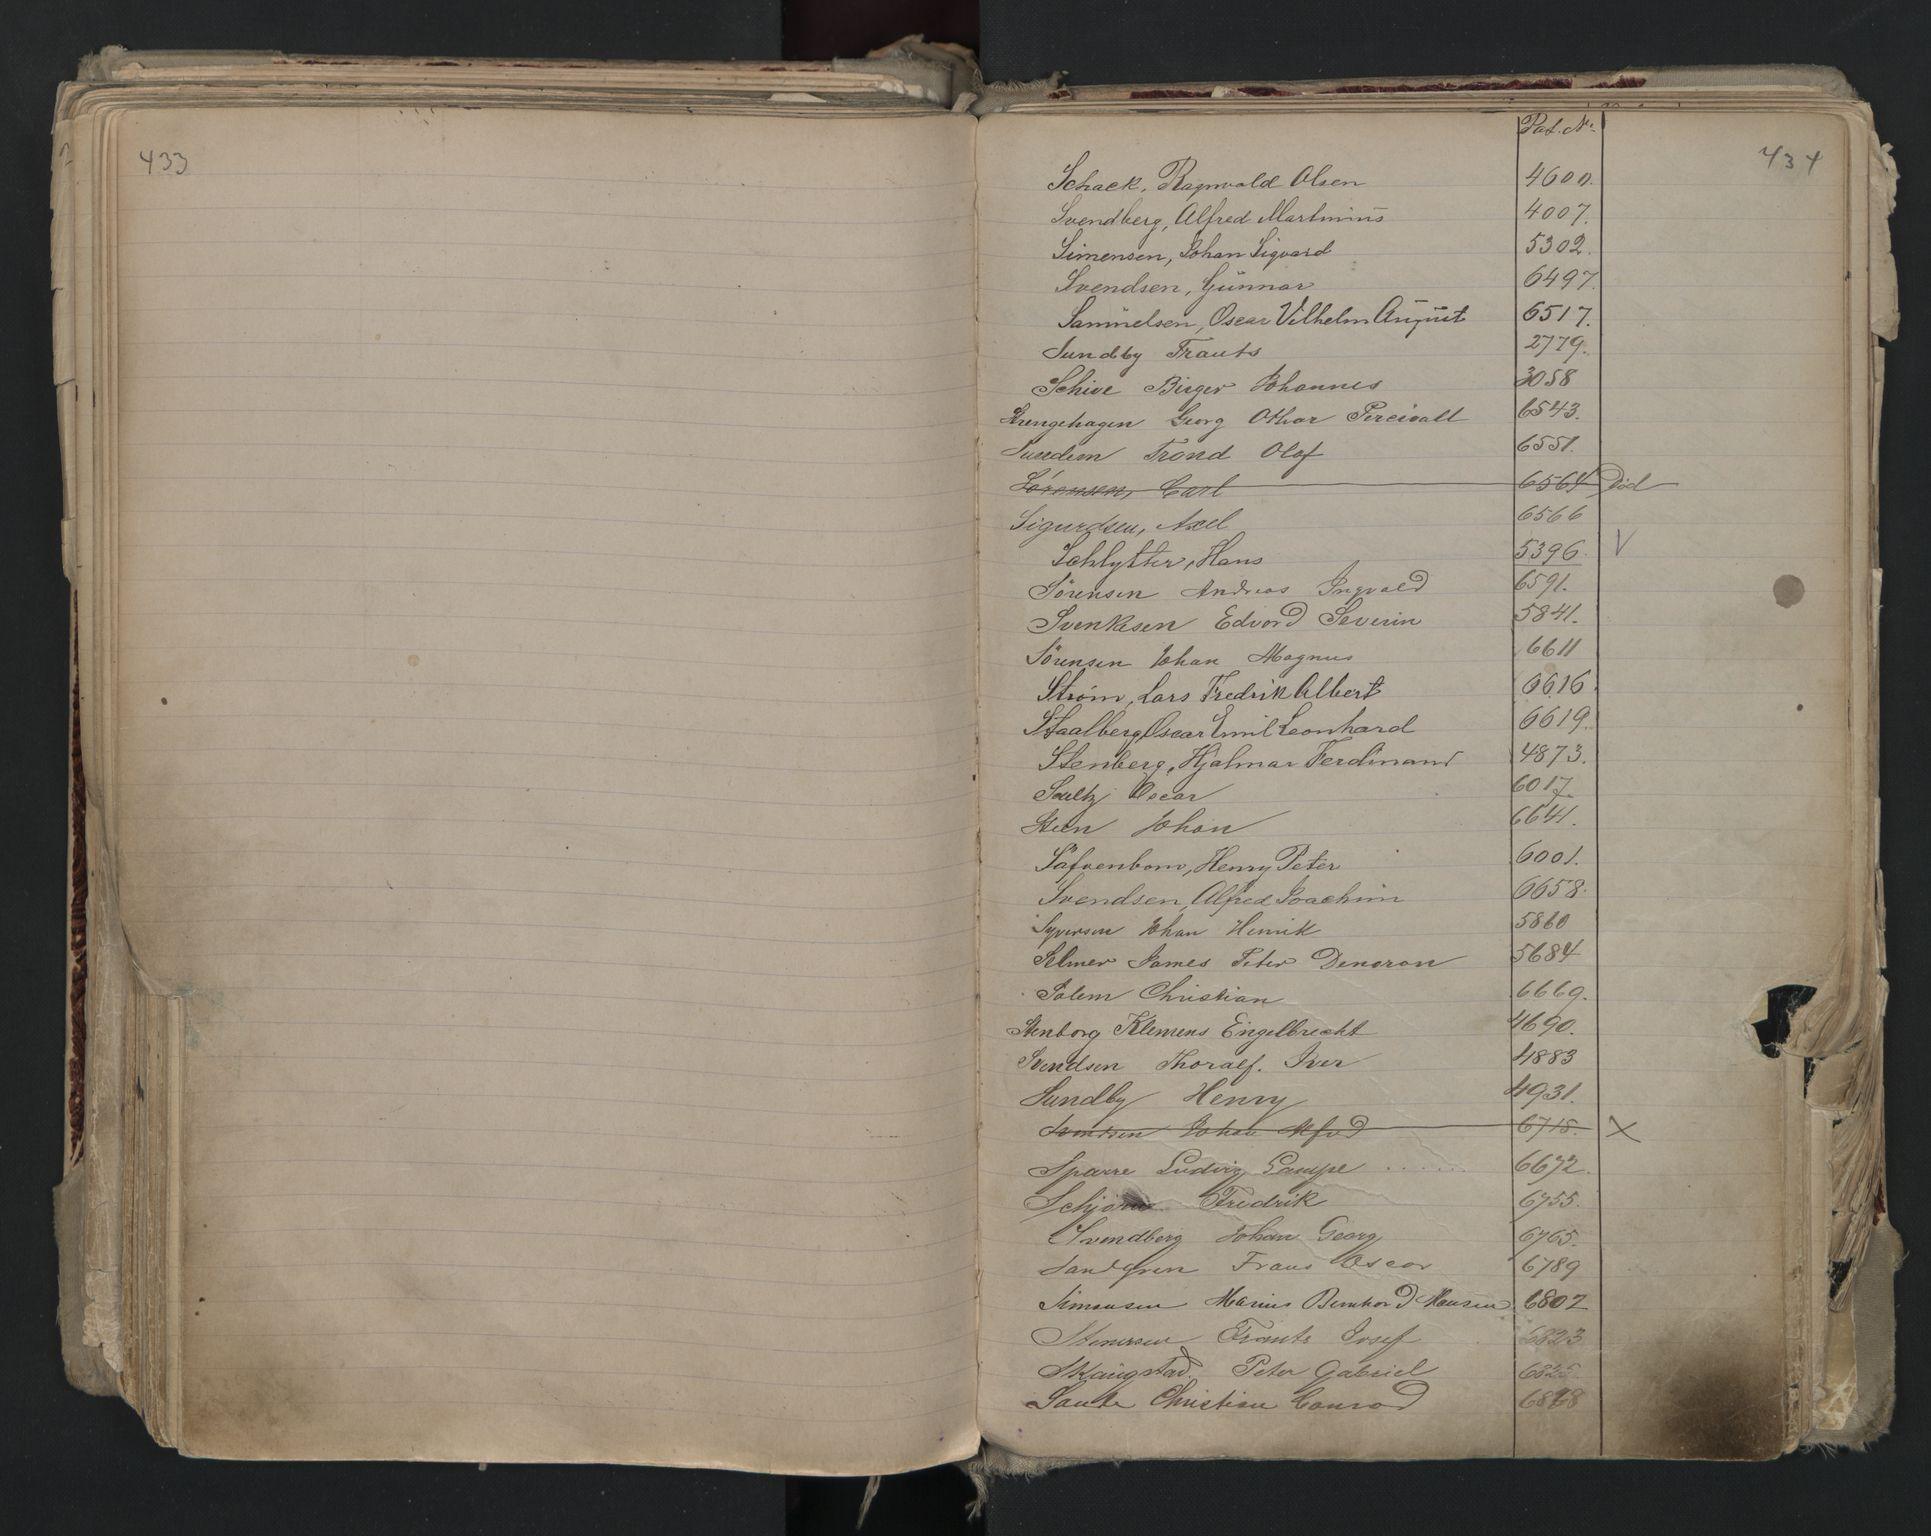 SAO, Oslo sjømannskontor, F/Fa/L0002: Register for Kristiania krets, 1866-1930, s. 433-434